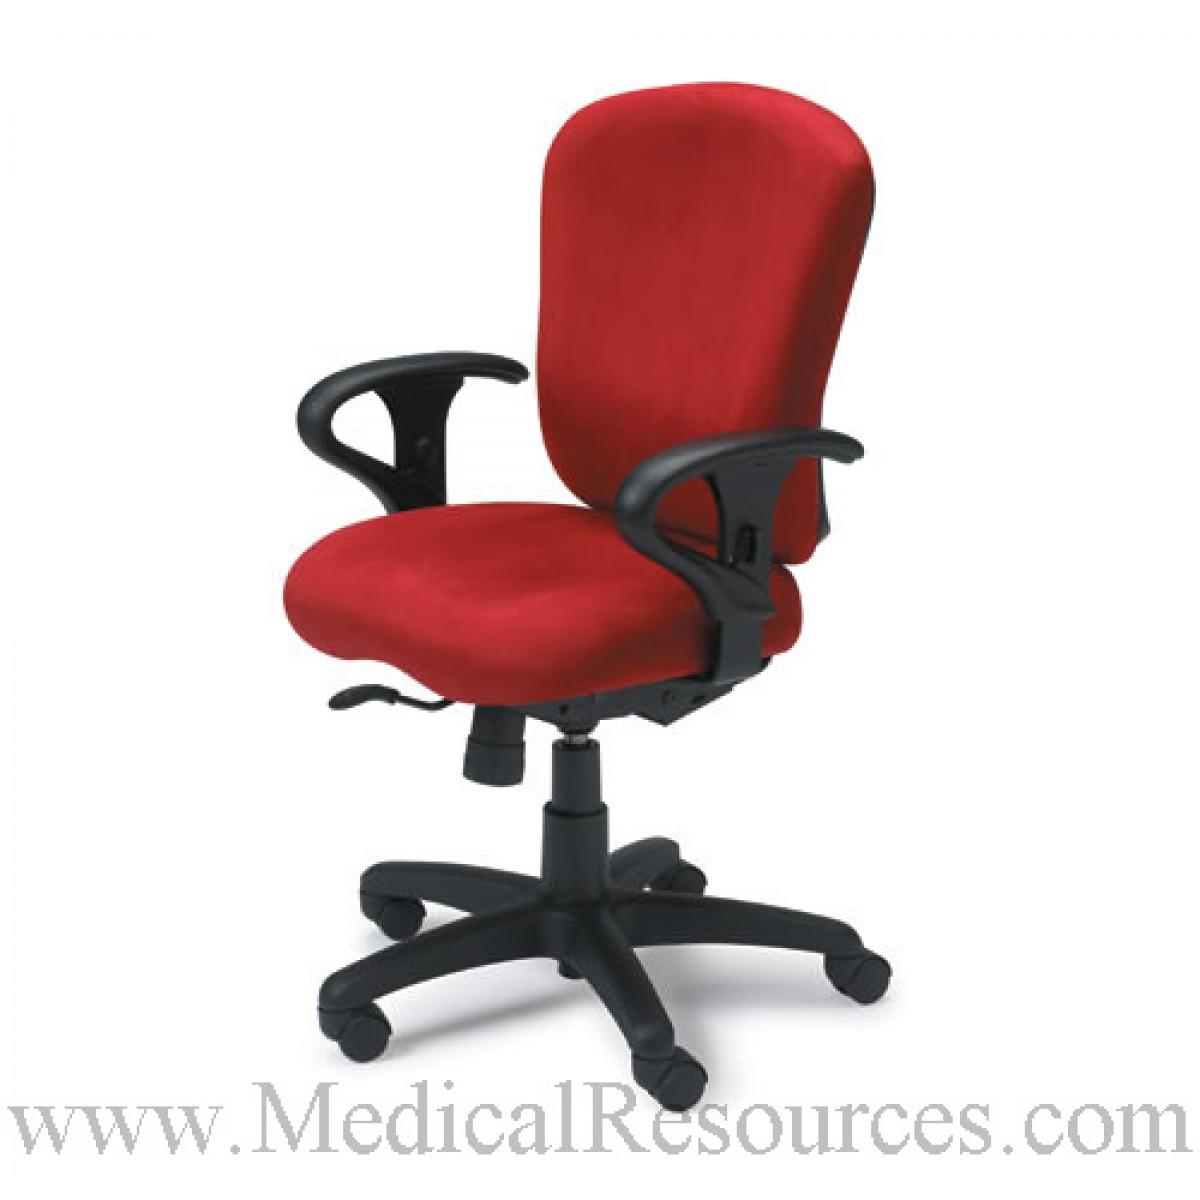 Ki S Impress Armless Task Chair In A Grade 2 Fabric 25 W X 18 D X 37 45 H